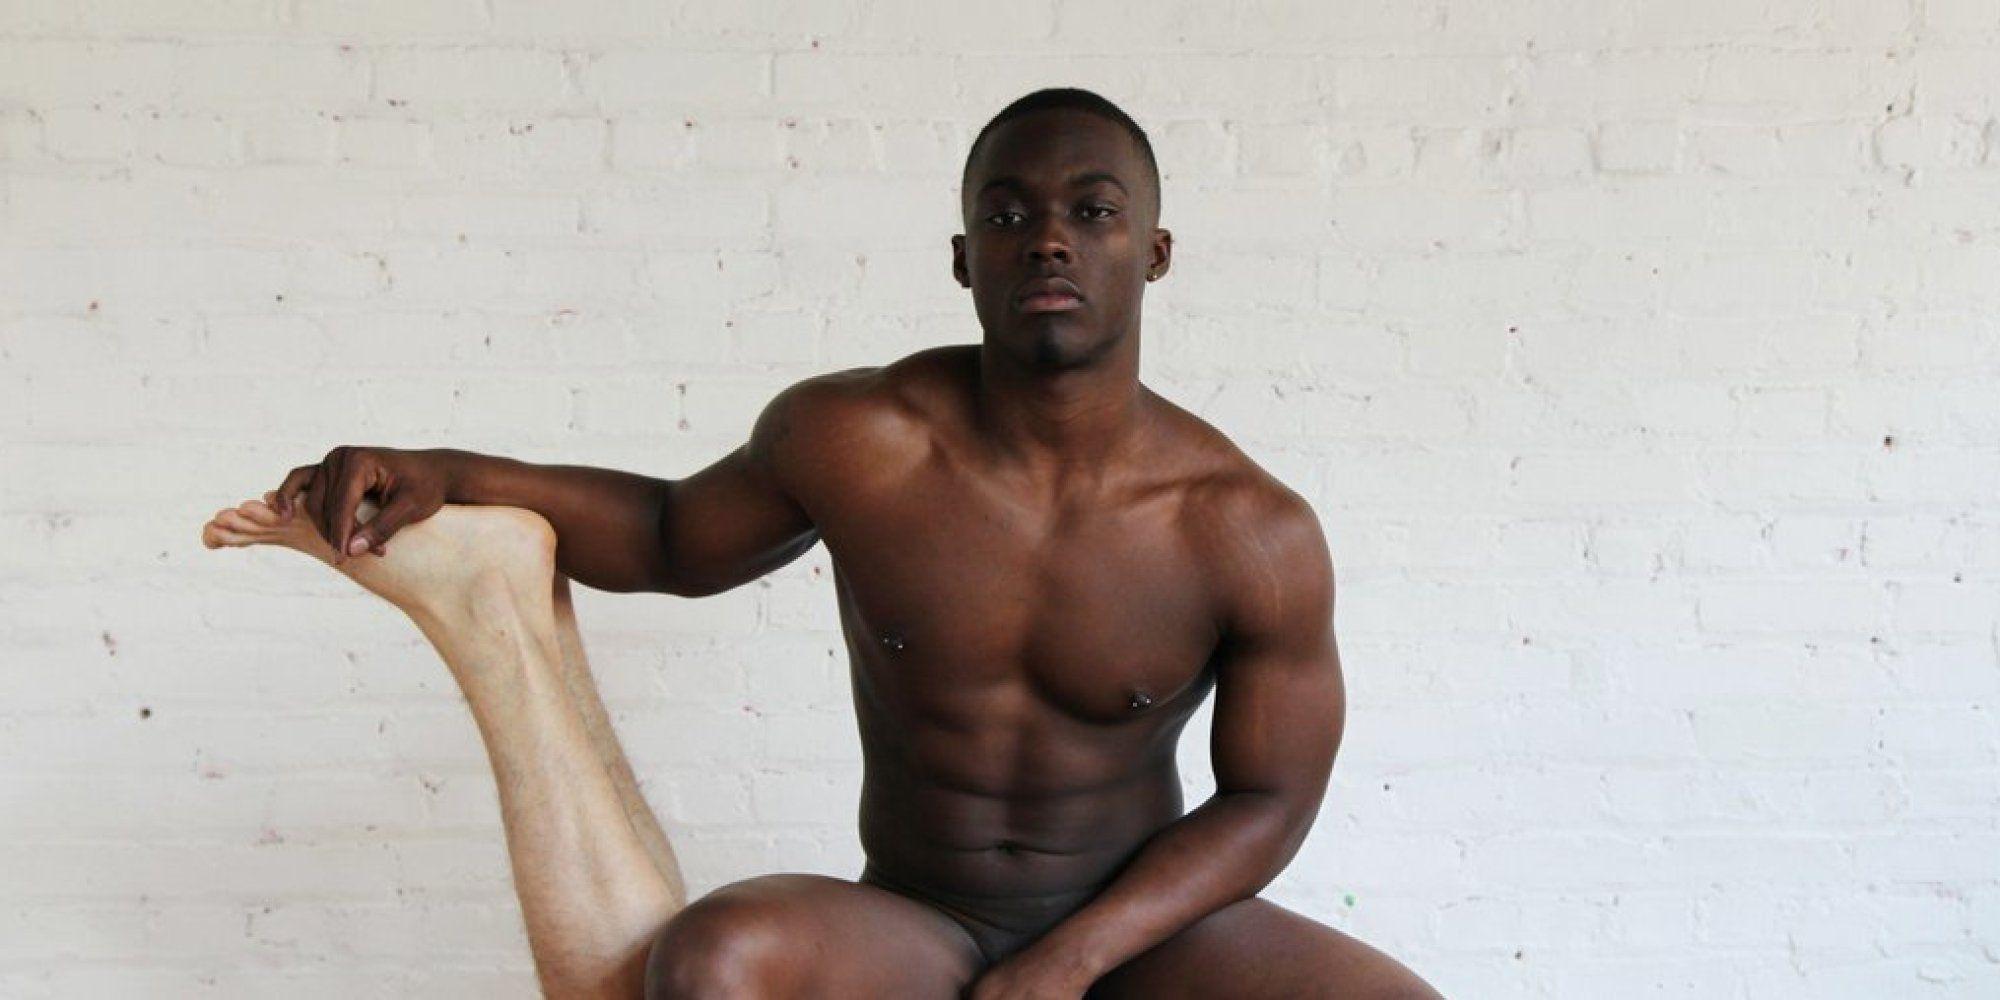 Black gay escort